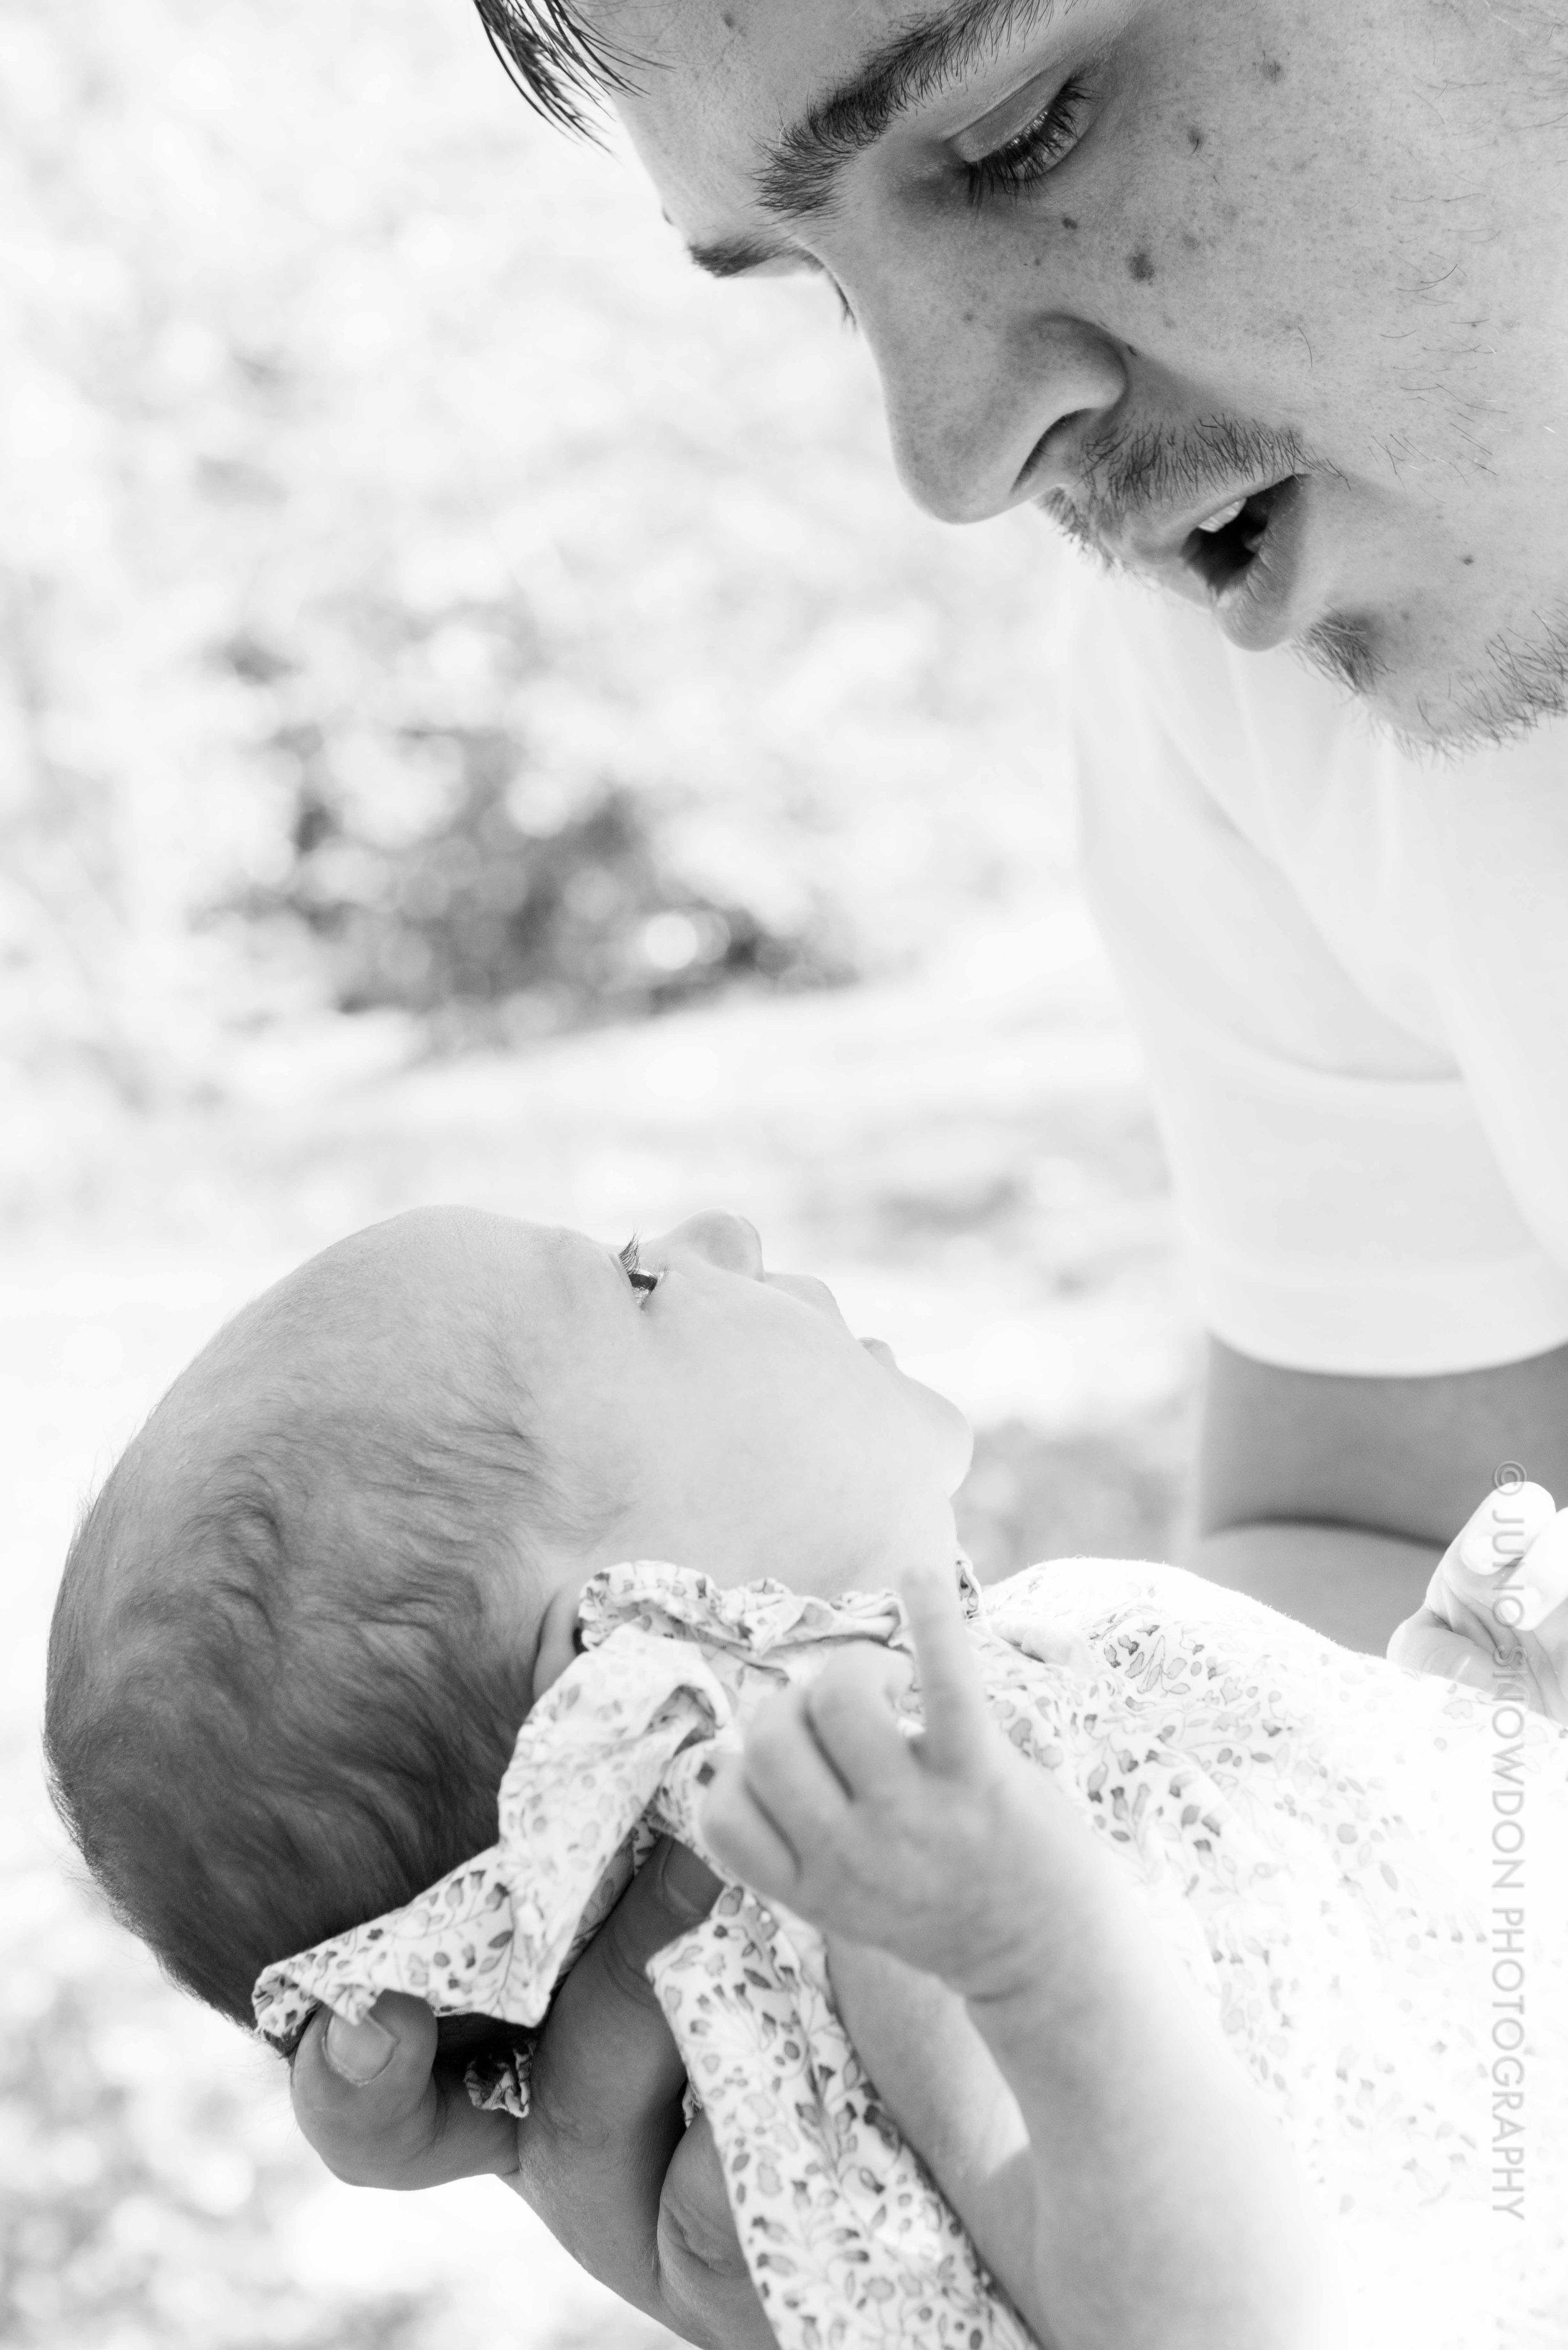 juno-snowdon-photography-newborn-6051.jpg